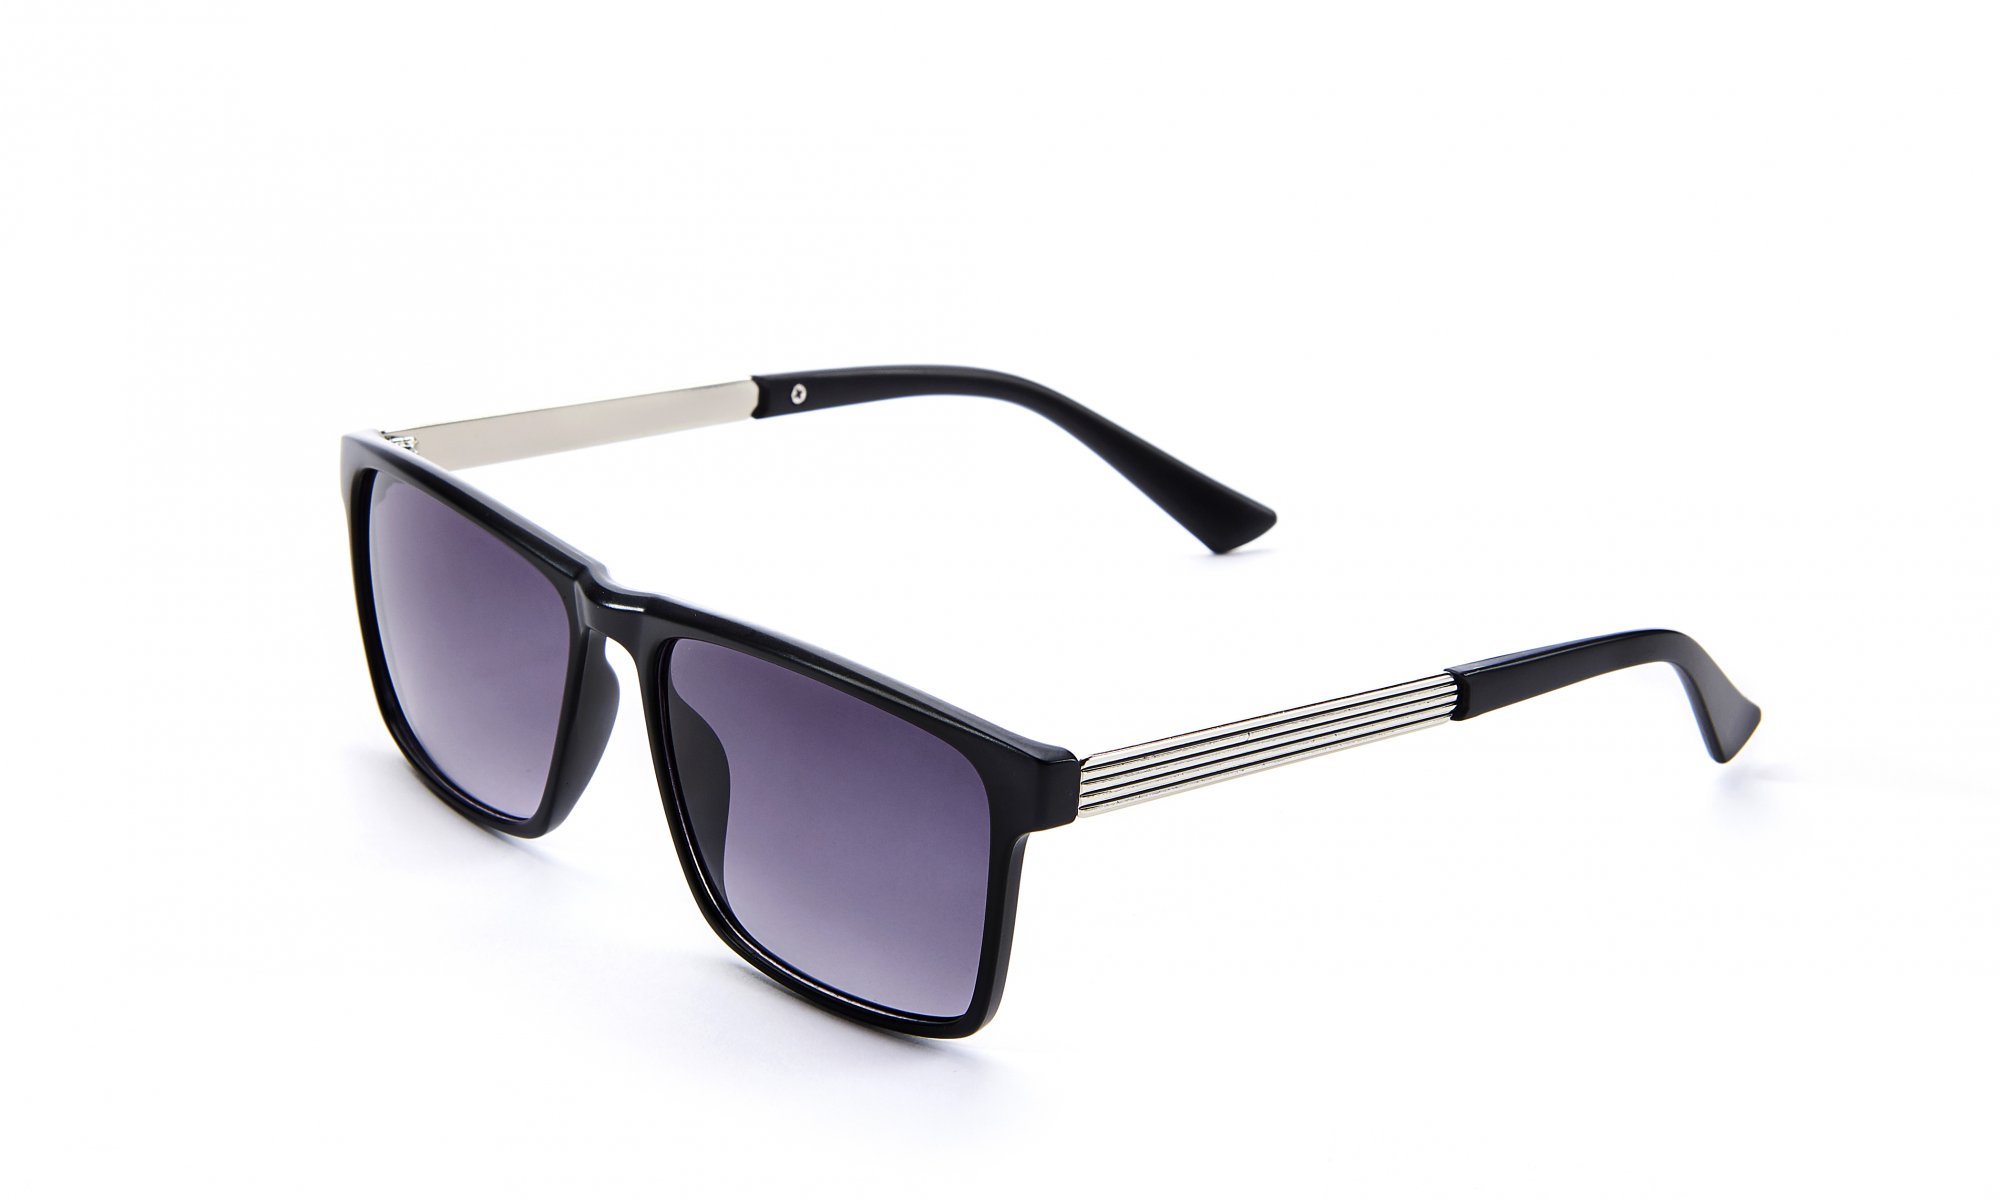 Black Sunglasses with Case & Cloth